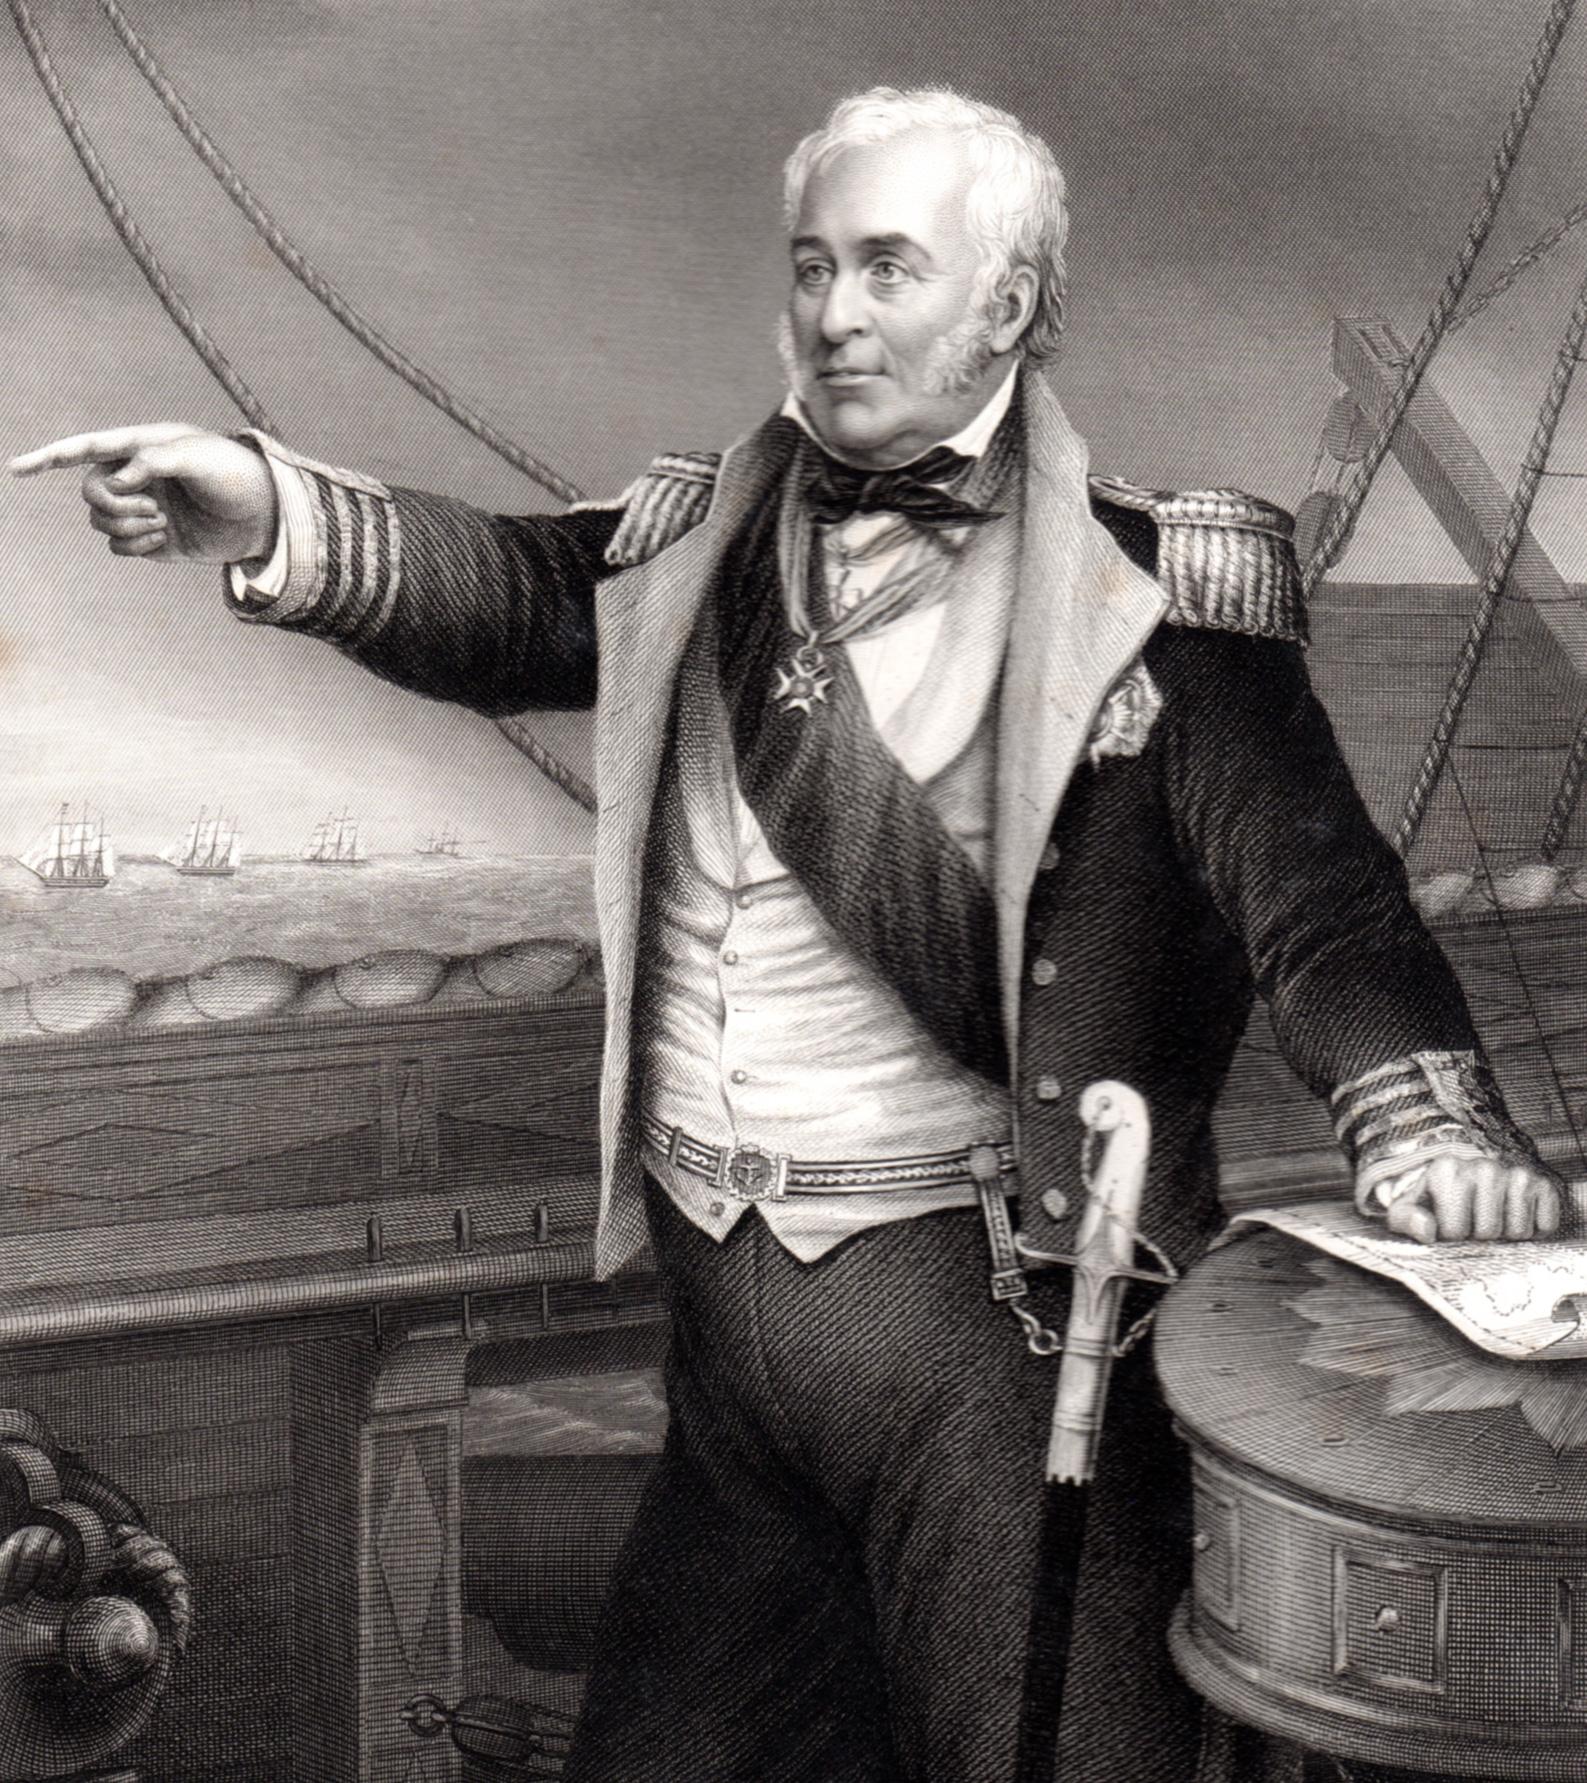 Miscellaneous Admirals, Captains, etc.